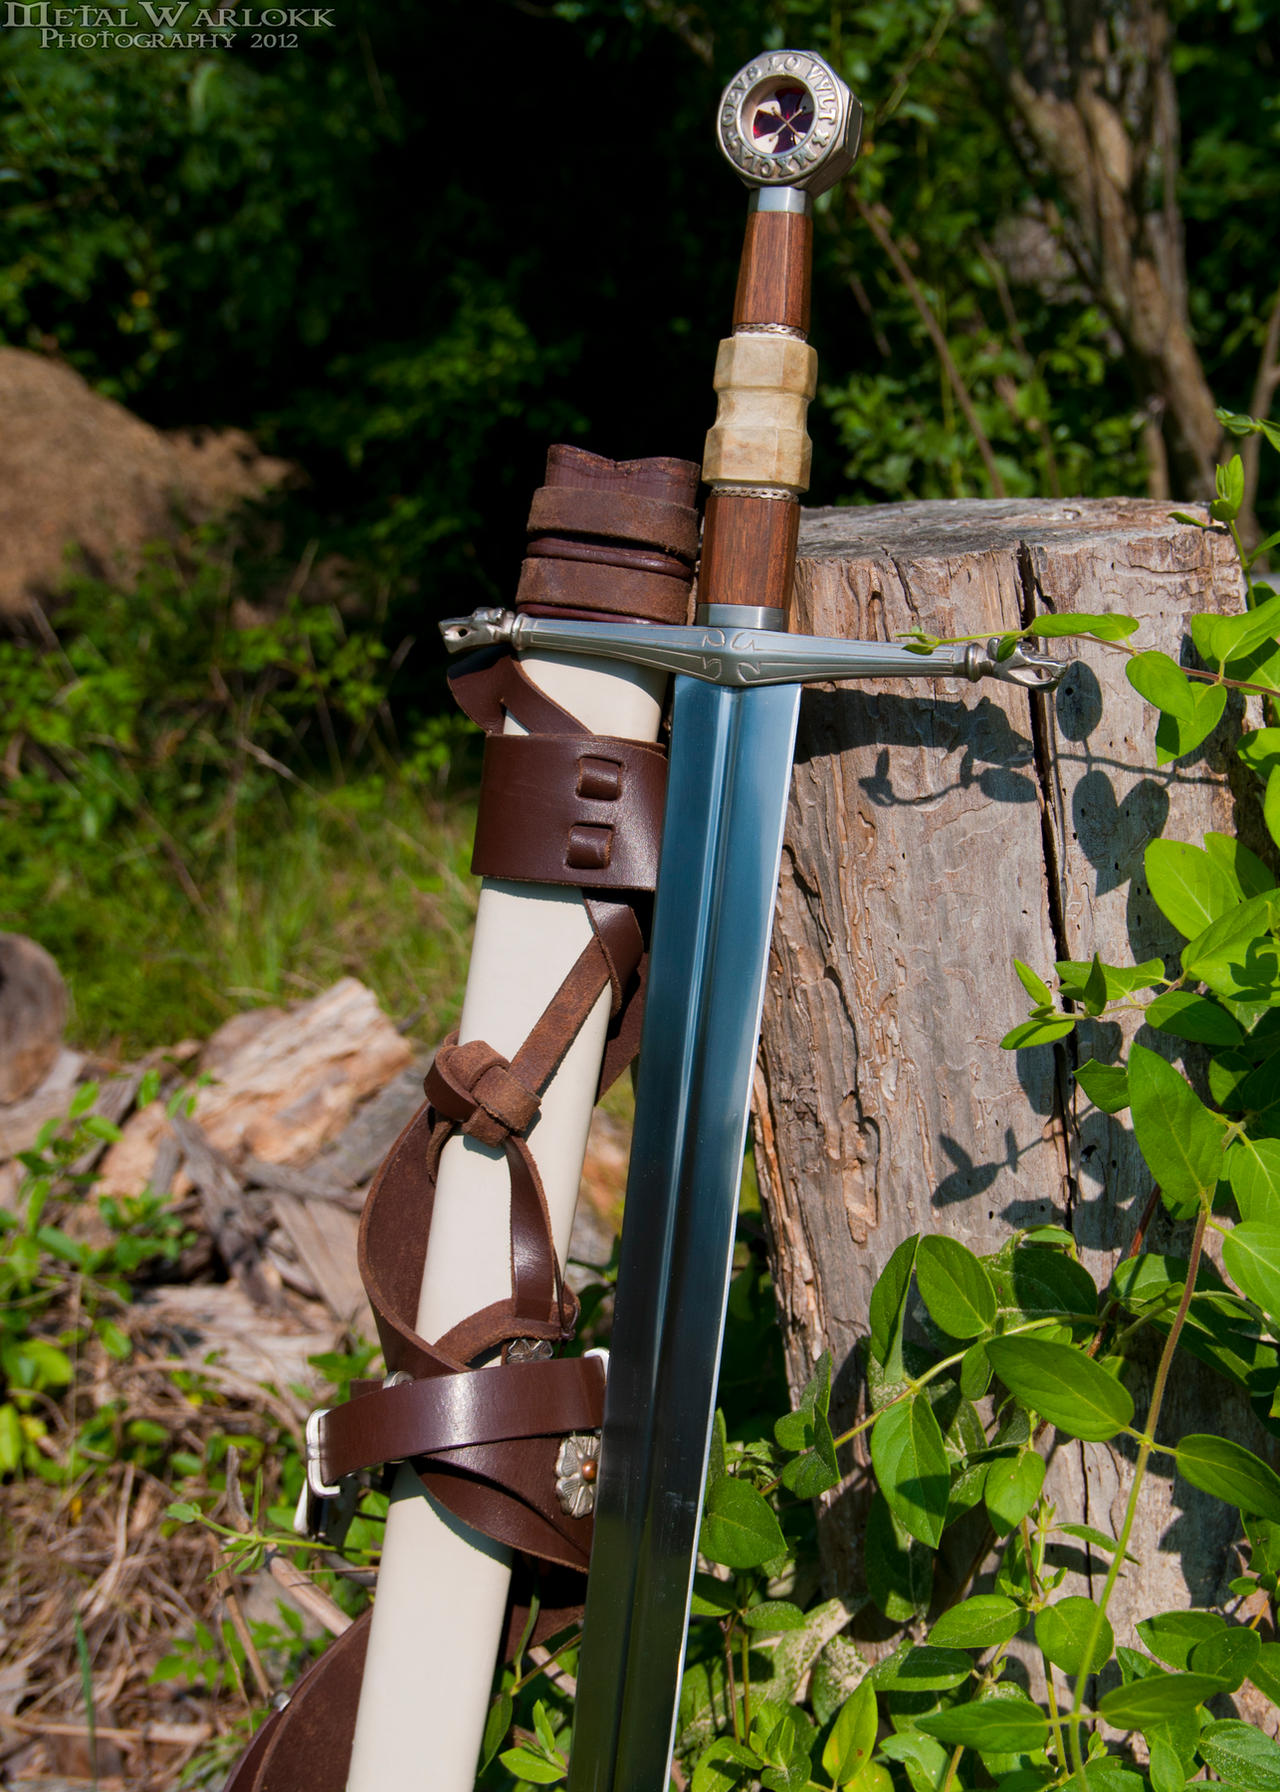 Sword of Ibelin by MetalWarlokk